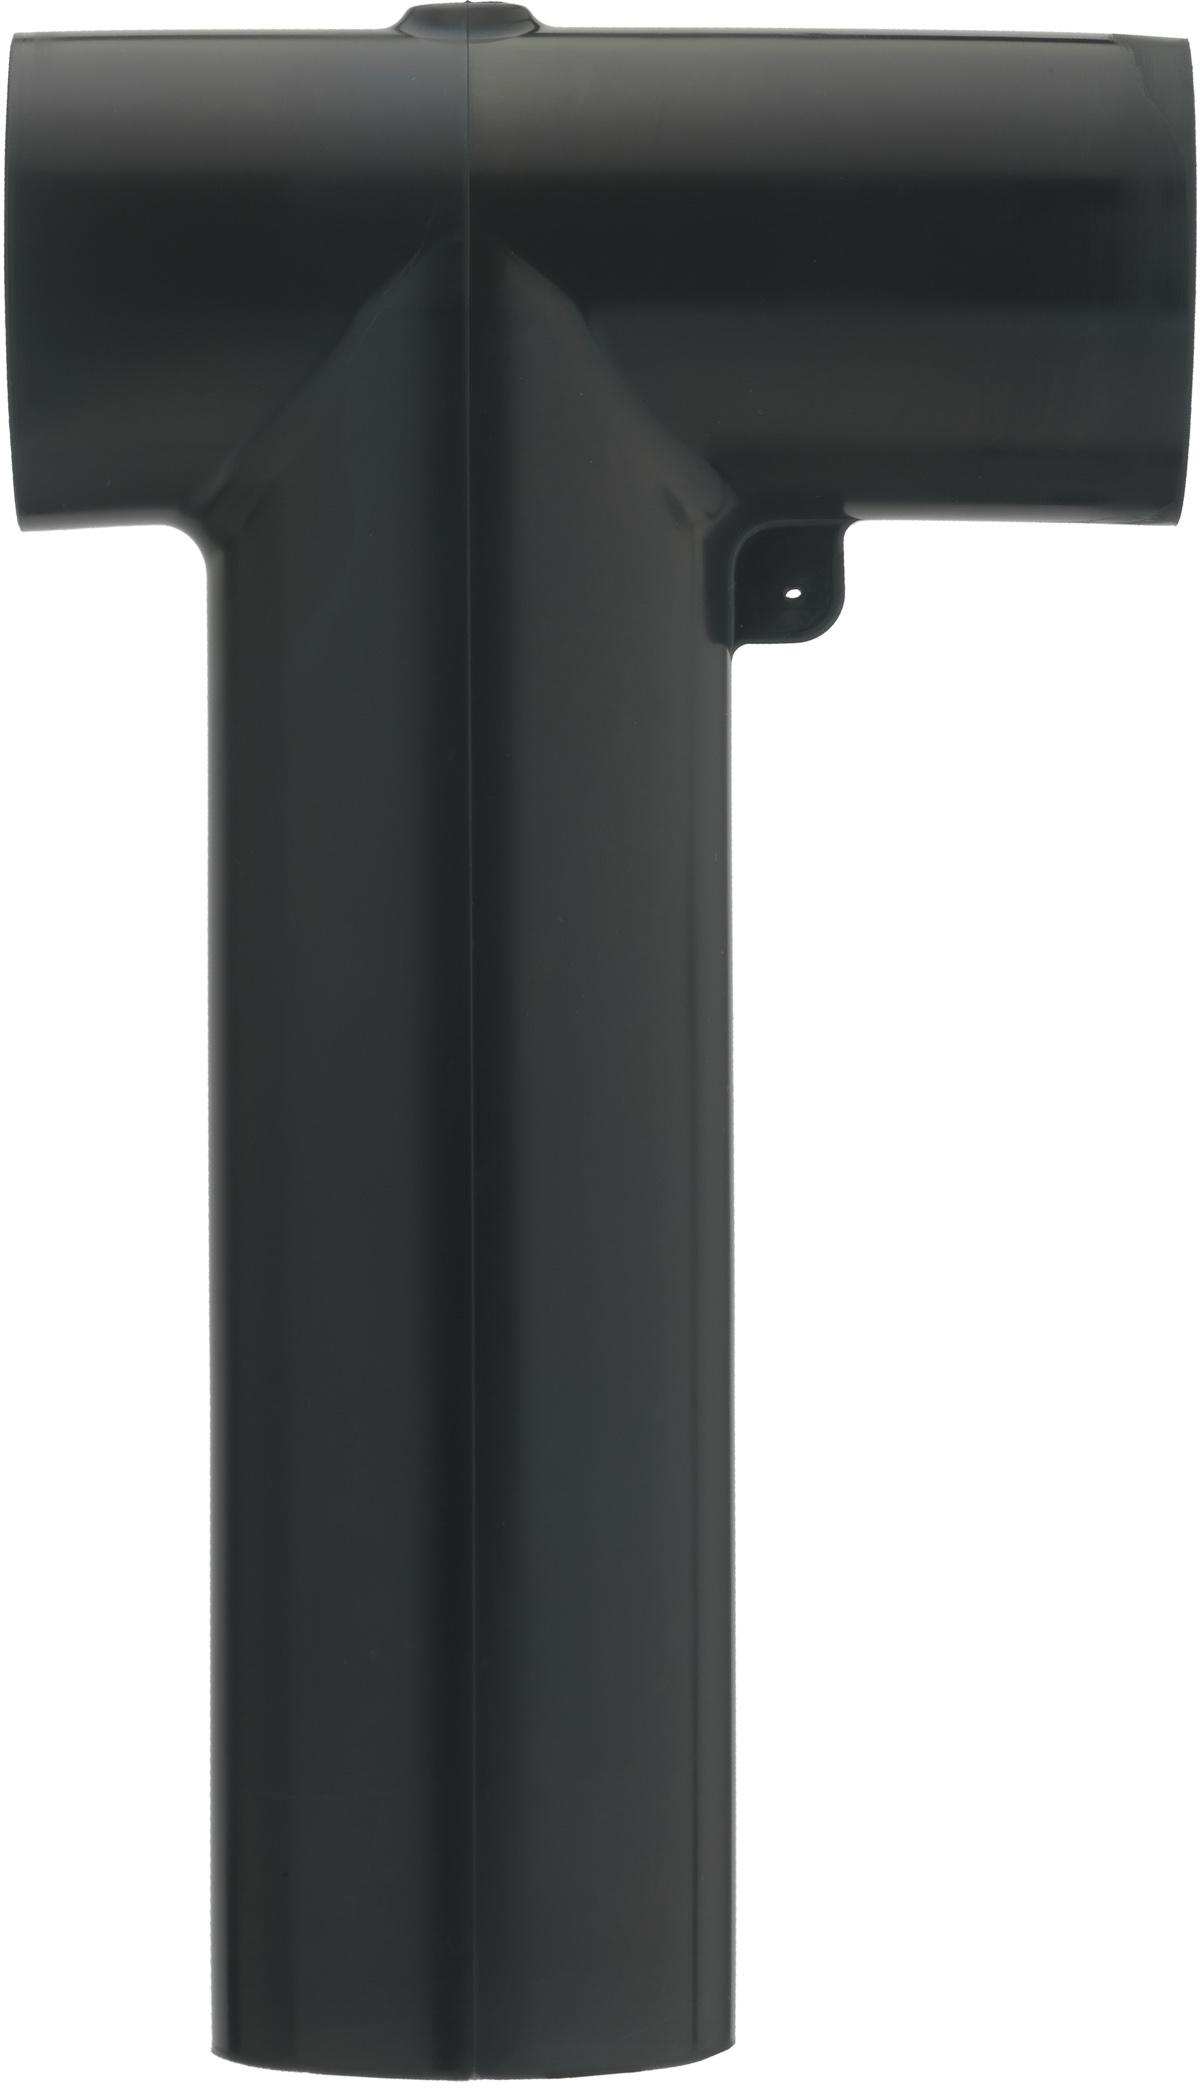 ANSL-DON K484TB 12-24KV